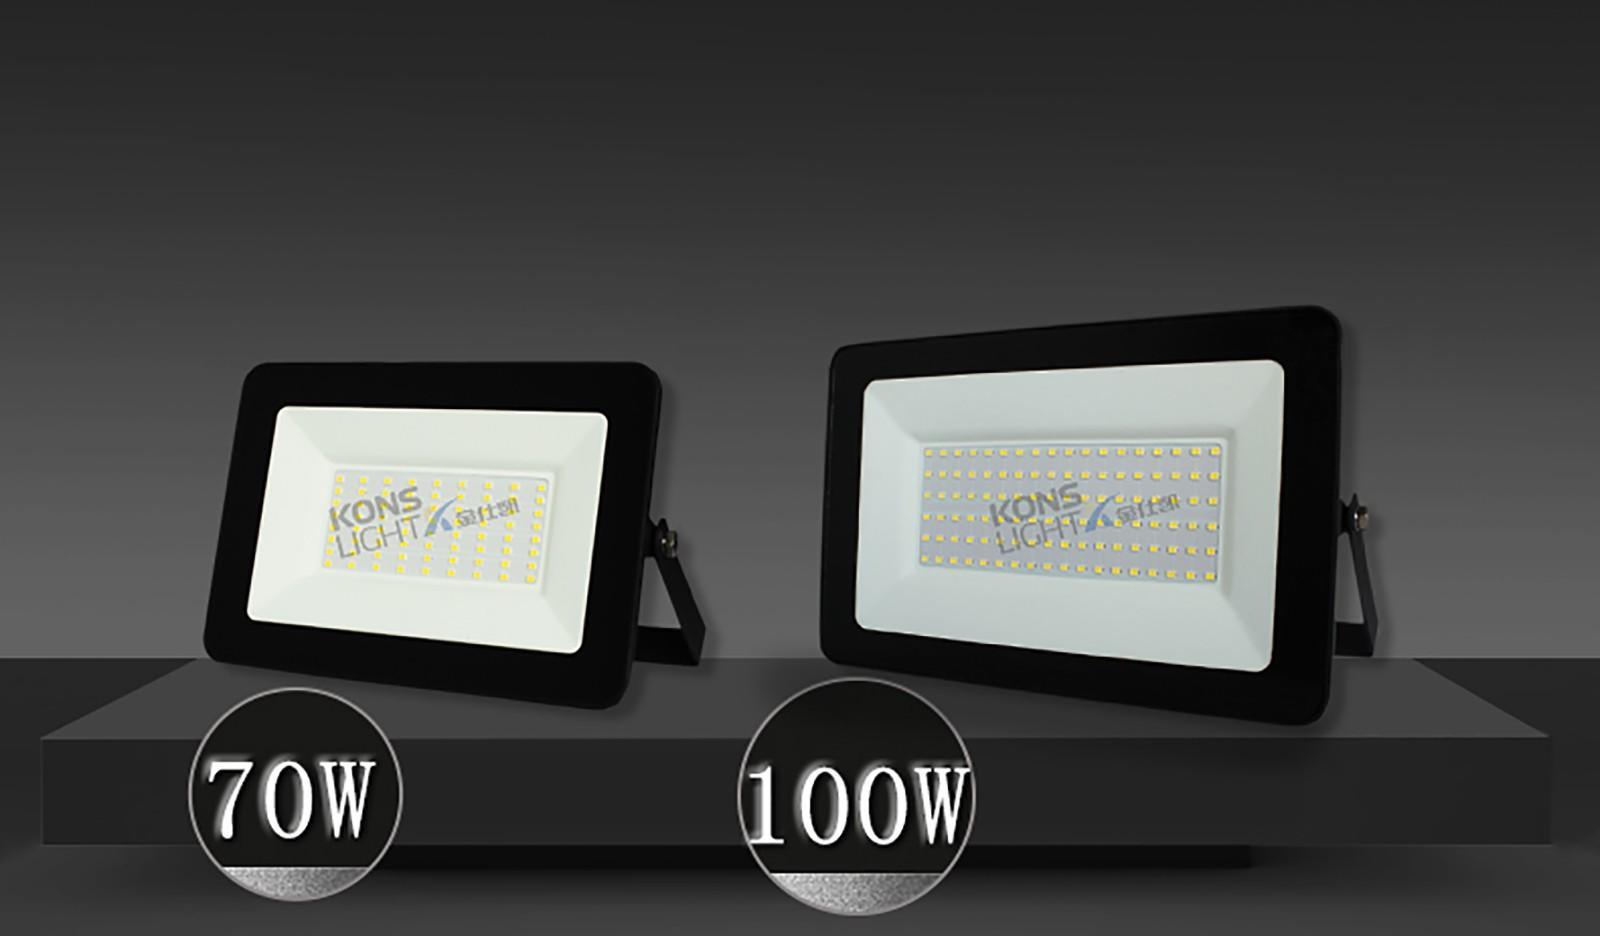 Kons-Led Light Supplier Led Flood Light 10w-300w 3000k-5700k Uv Resistance-2